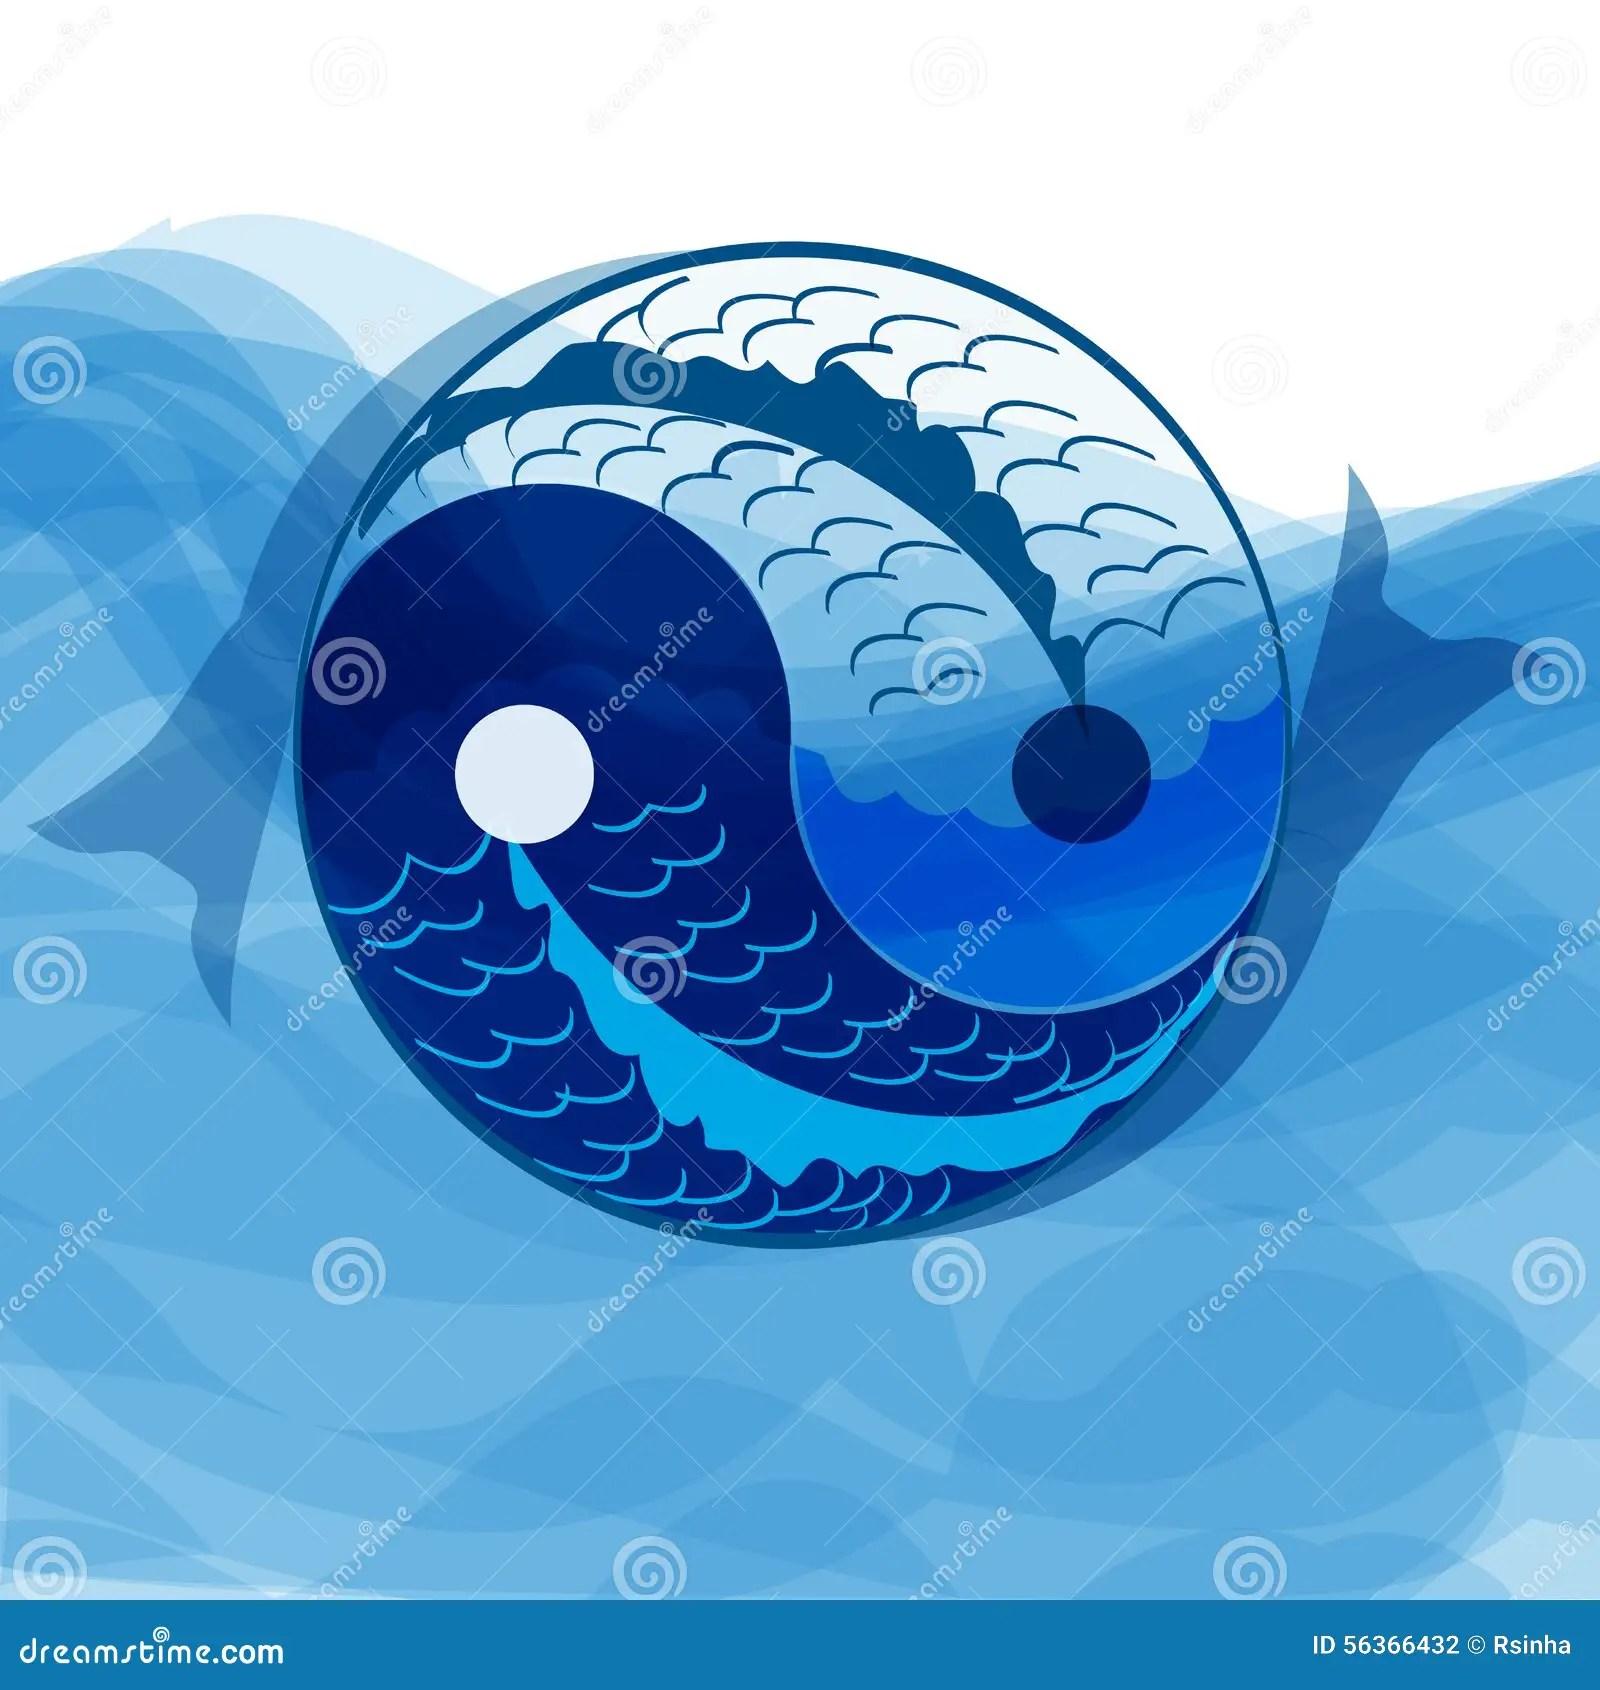 hight resolution of yan yi symbol of harmony and balance with koi fish